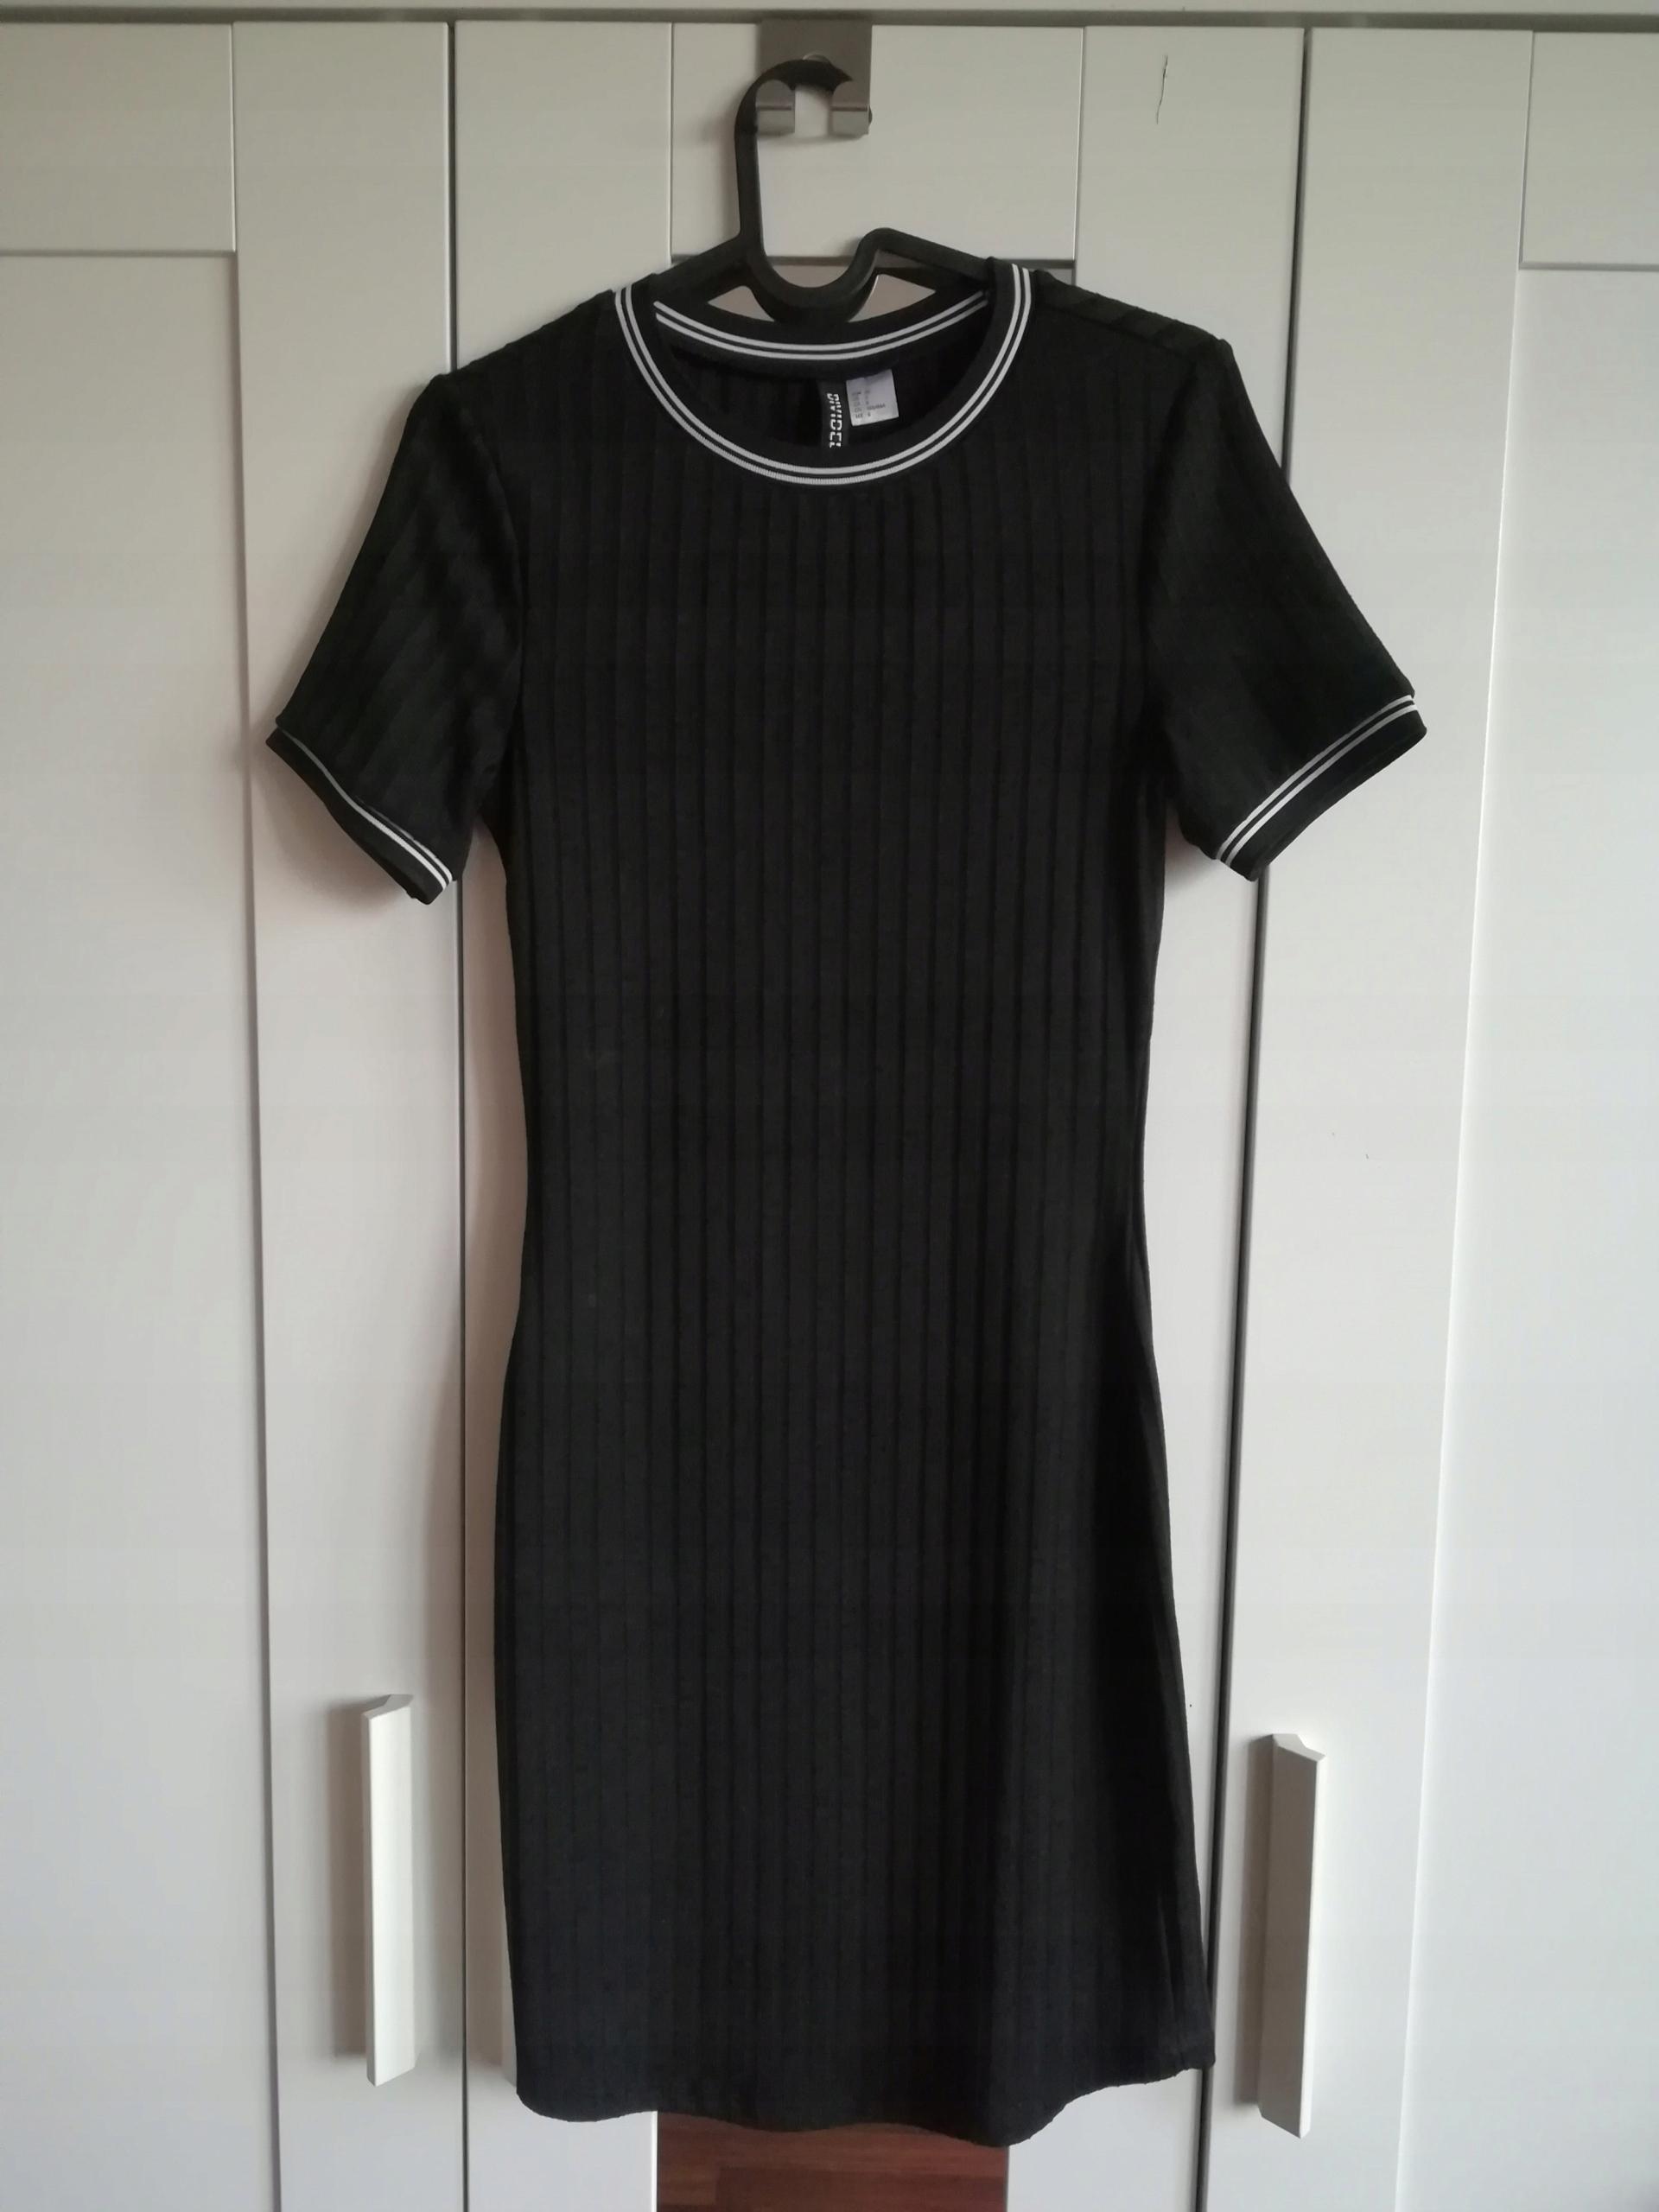 1fcfb4dbea Sukienka H M czarna 36 - 7579092703 - oficjalne archiwum allegro